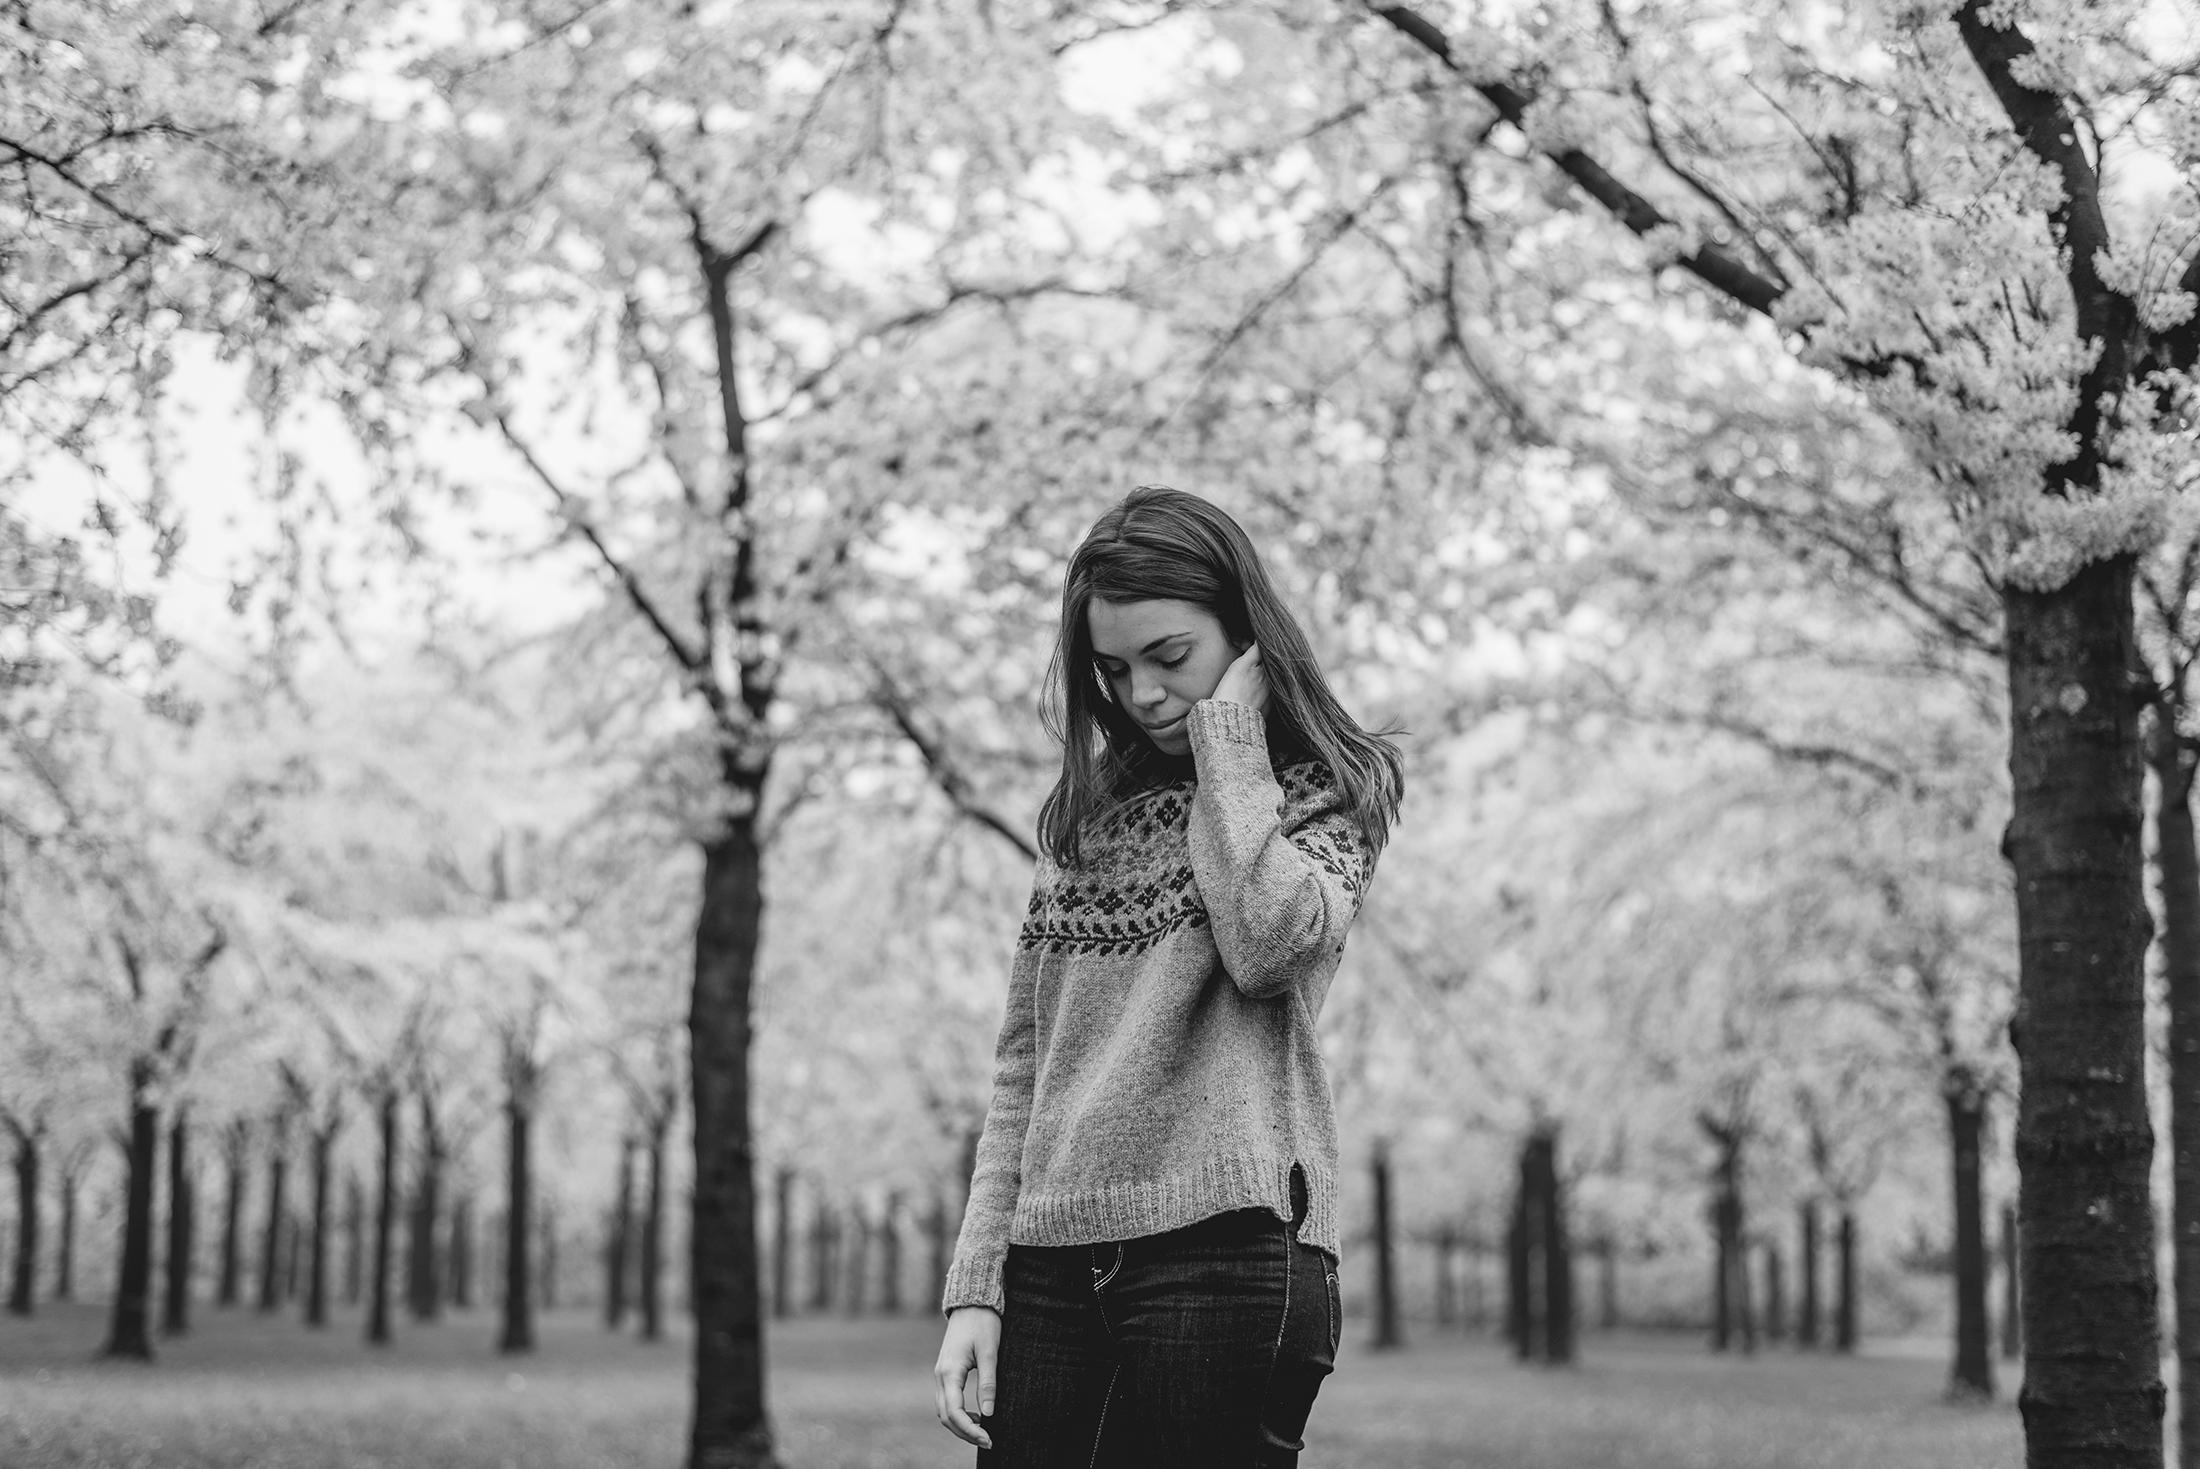 portrait black and white photography knitting birkin sweater hanami sakura cherry blossom